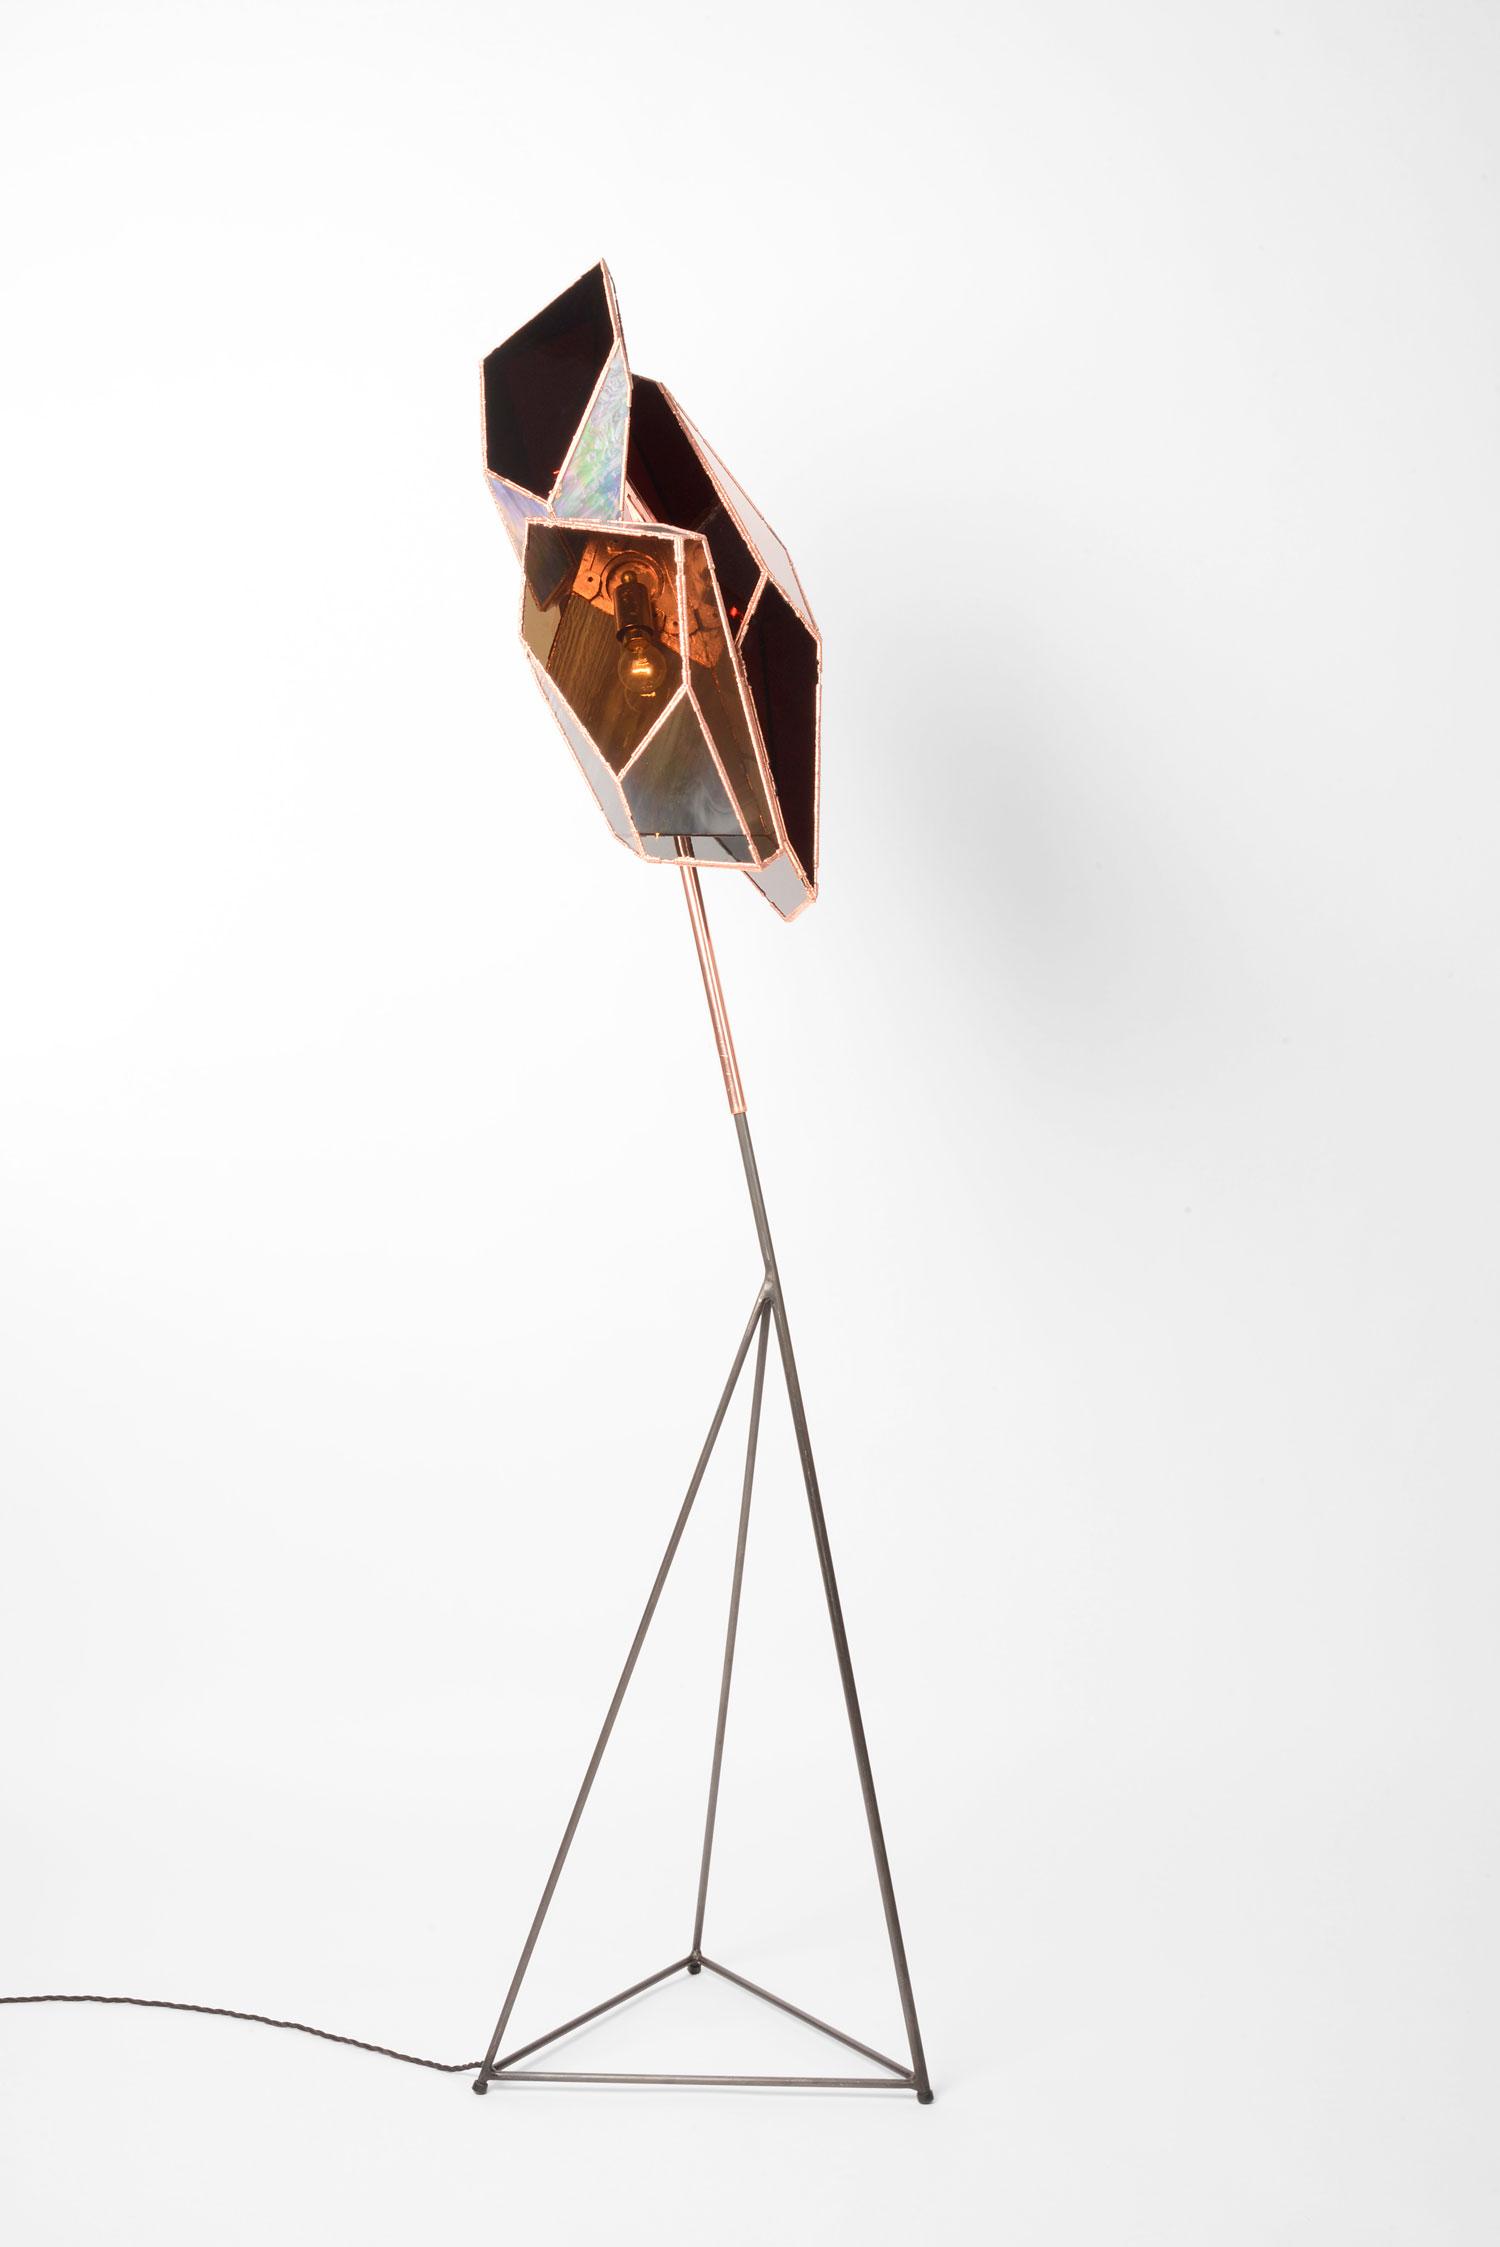 OverNight Floor Lamp 2 by Odd Matter at Design Days Dubai 2014   Yellowtrace